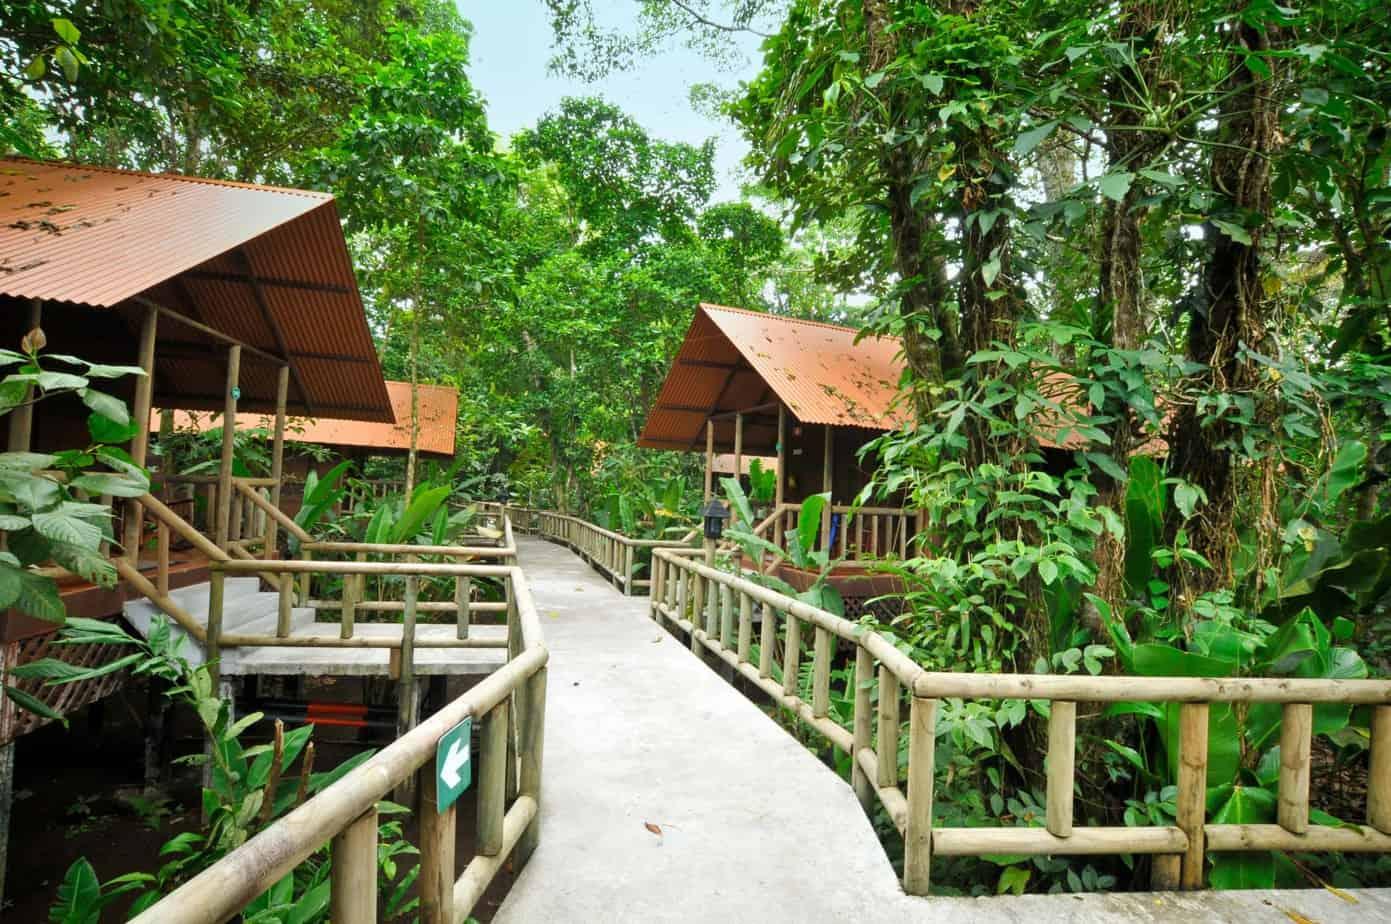 Tarpon Fishing Lodge on Costa Rica's Caribbean Coast